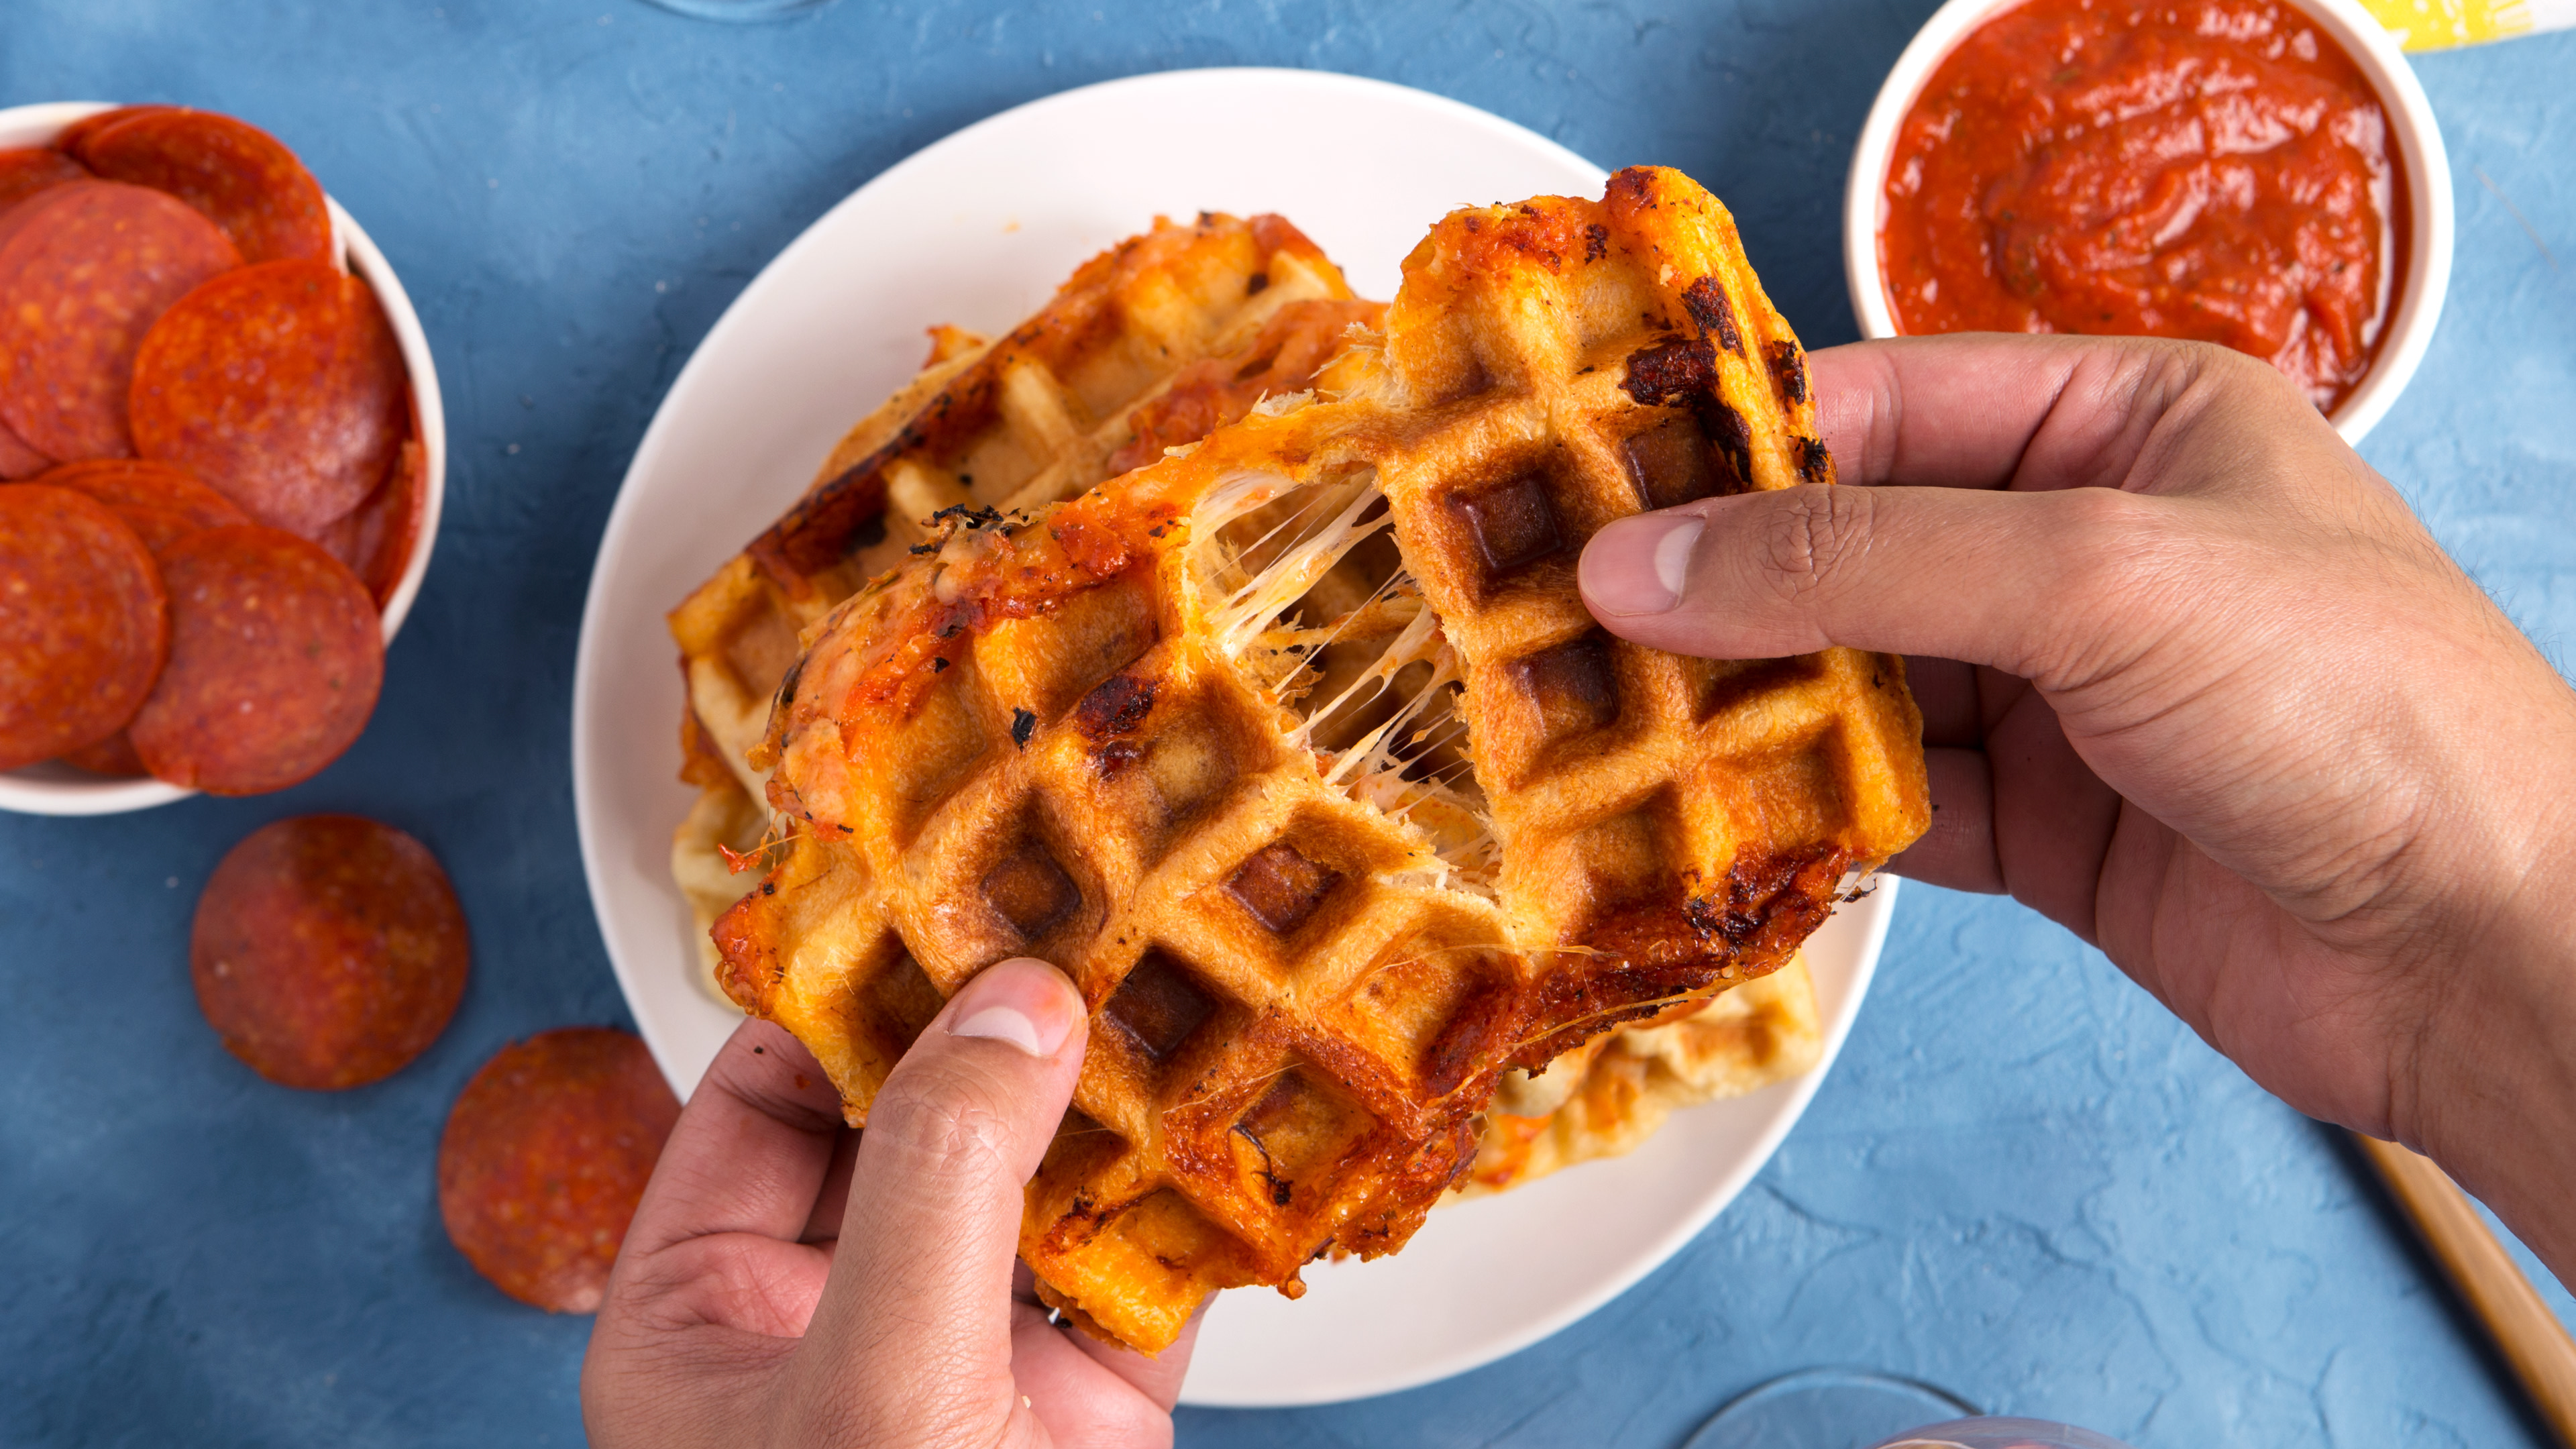 16 Weird, Unusual Recipes And Food Ideas - Food com